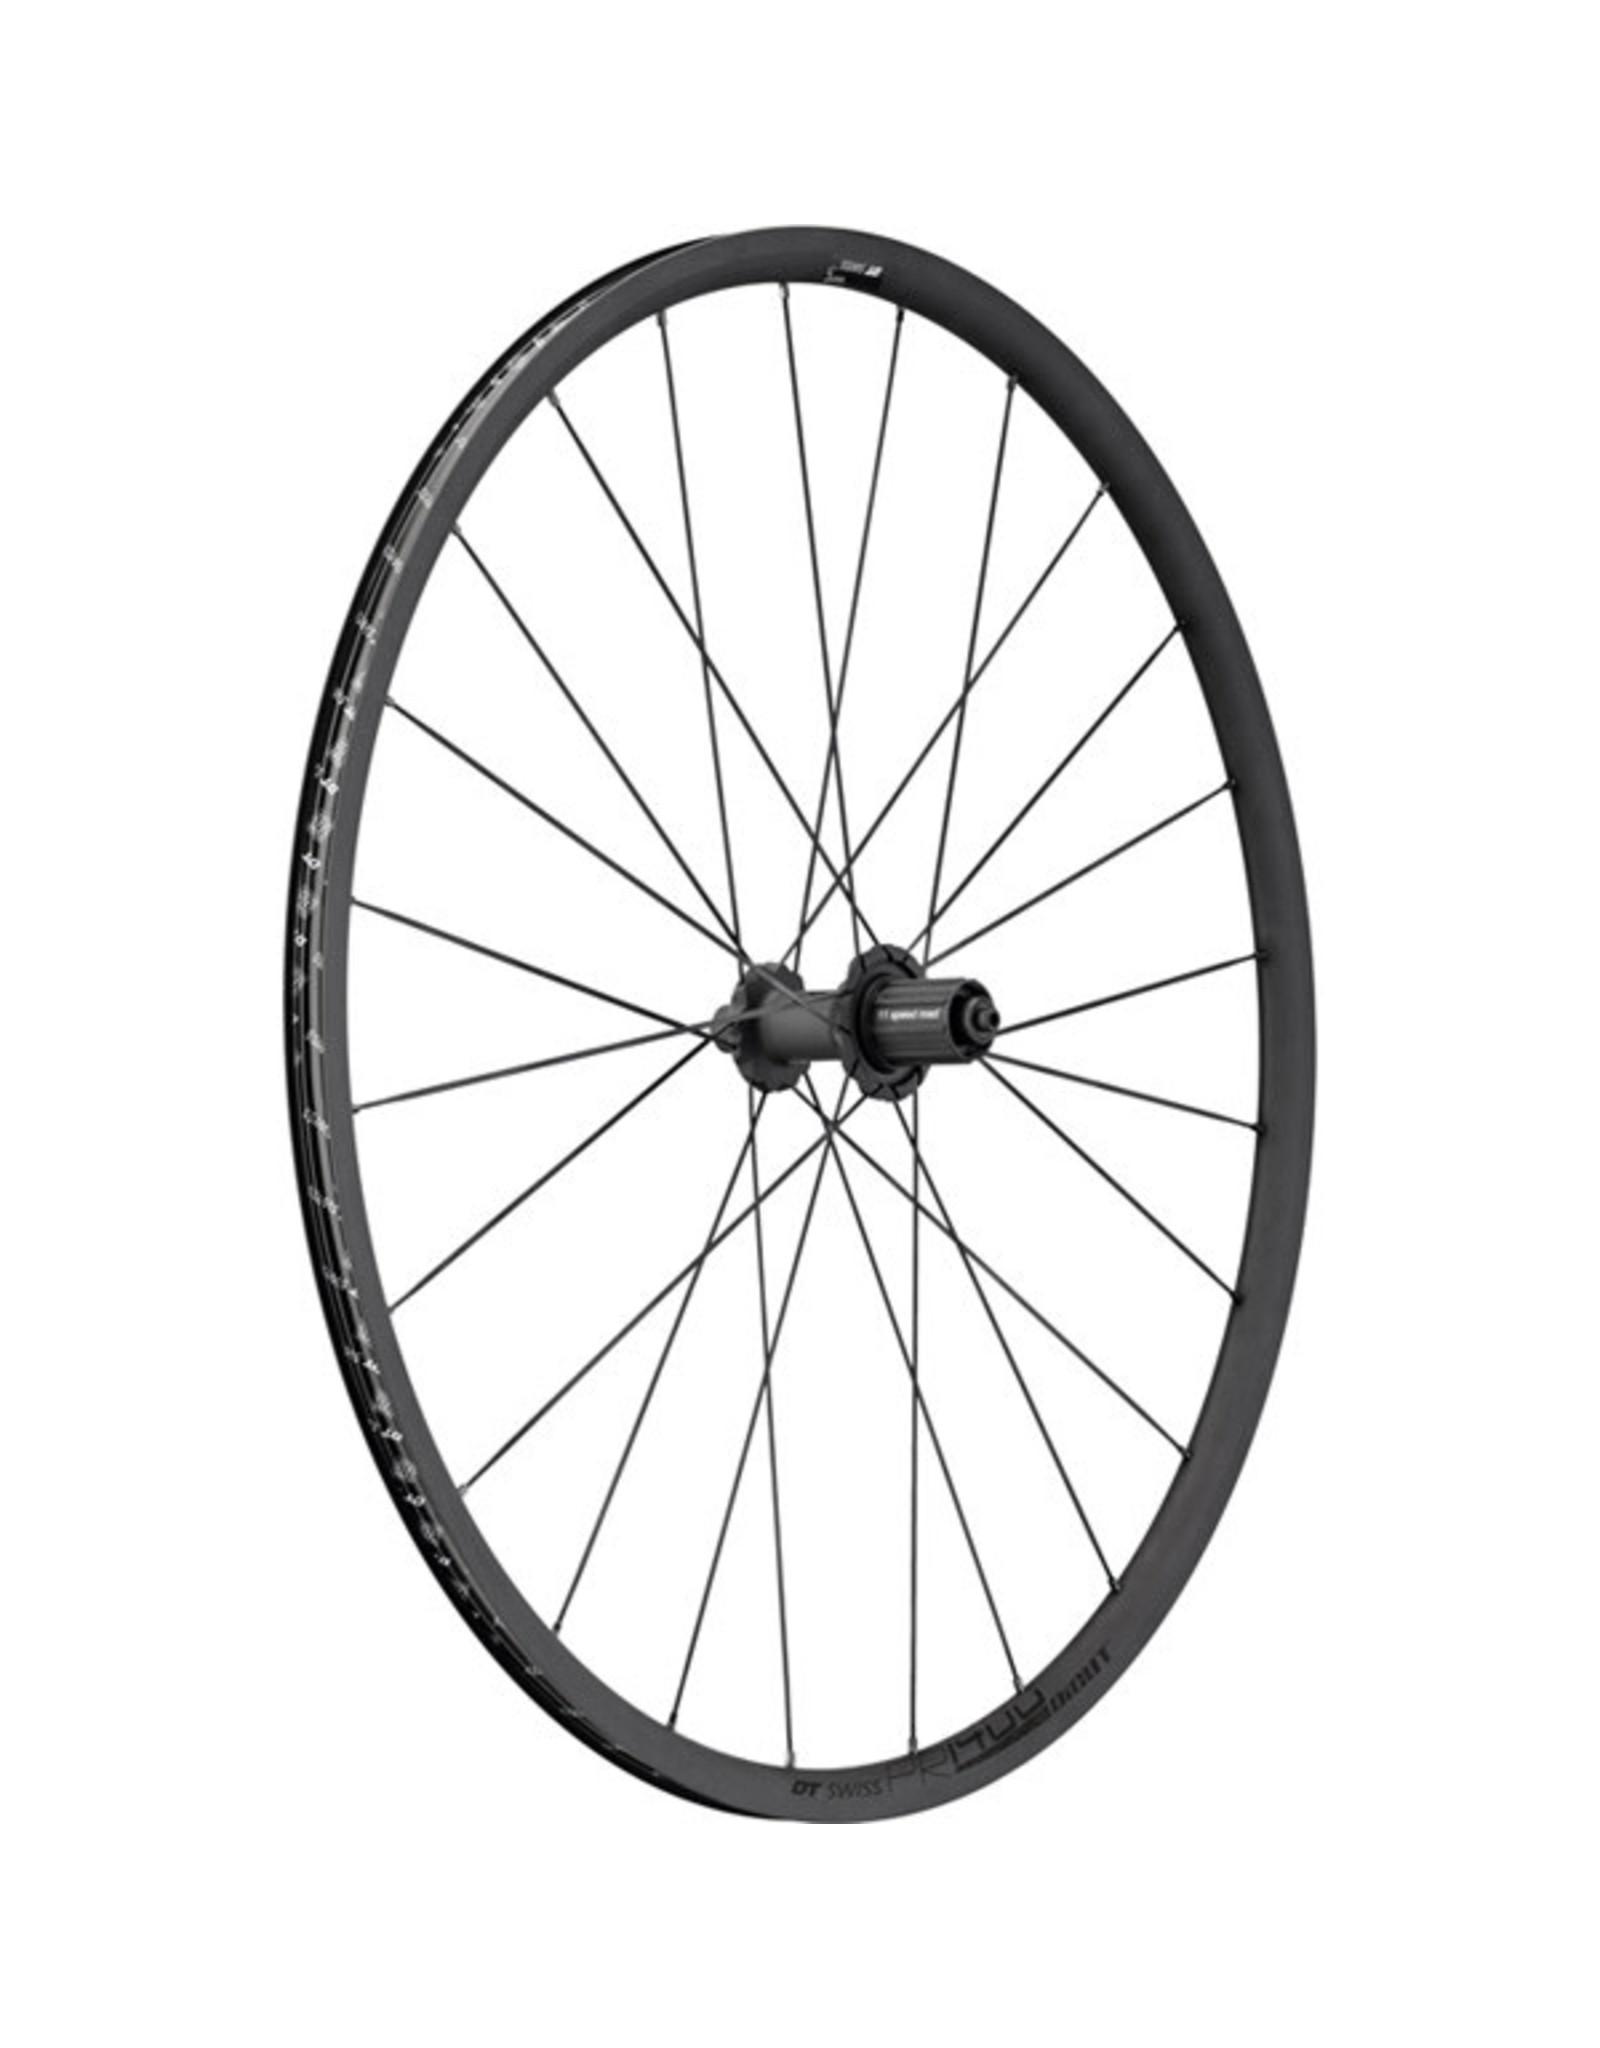 DT Swiss Wheel PR1400